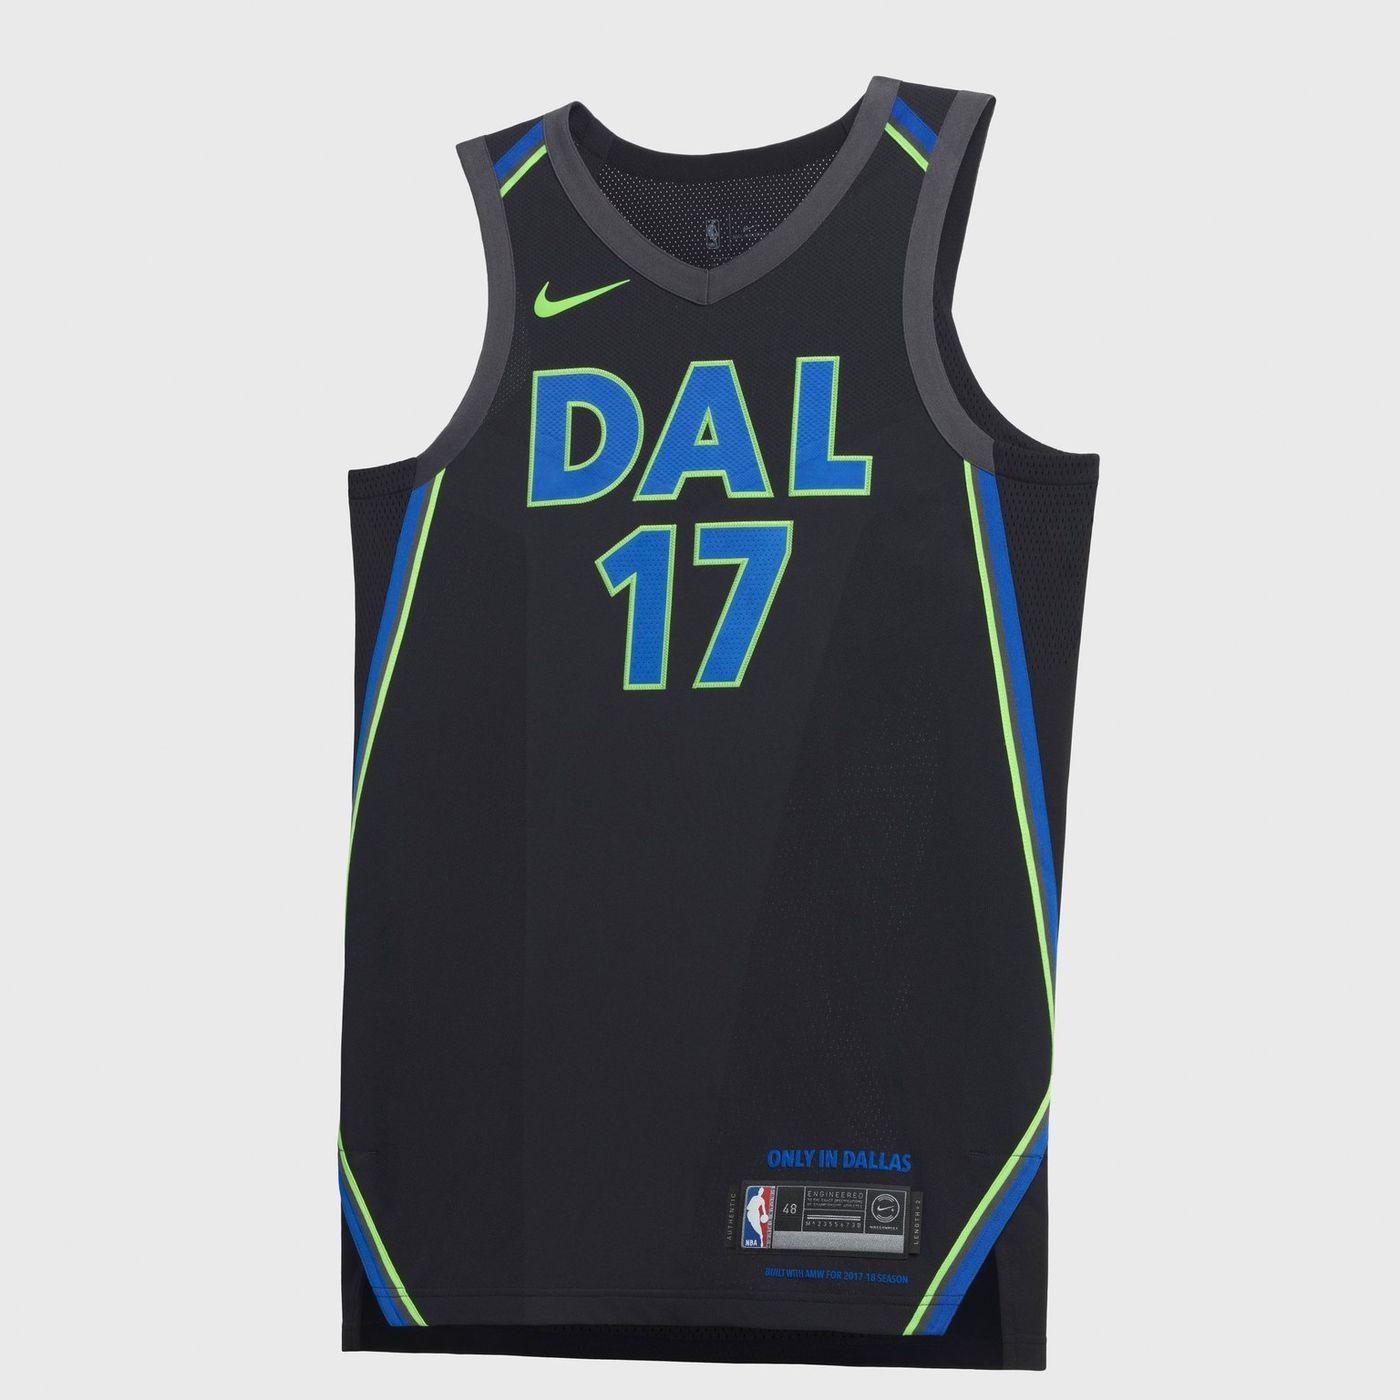 The Mavs  new uniforms are boring and uninspired - Mavs Moneyball c3e2720c4